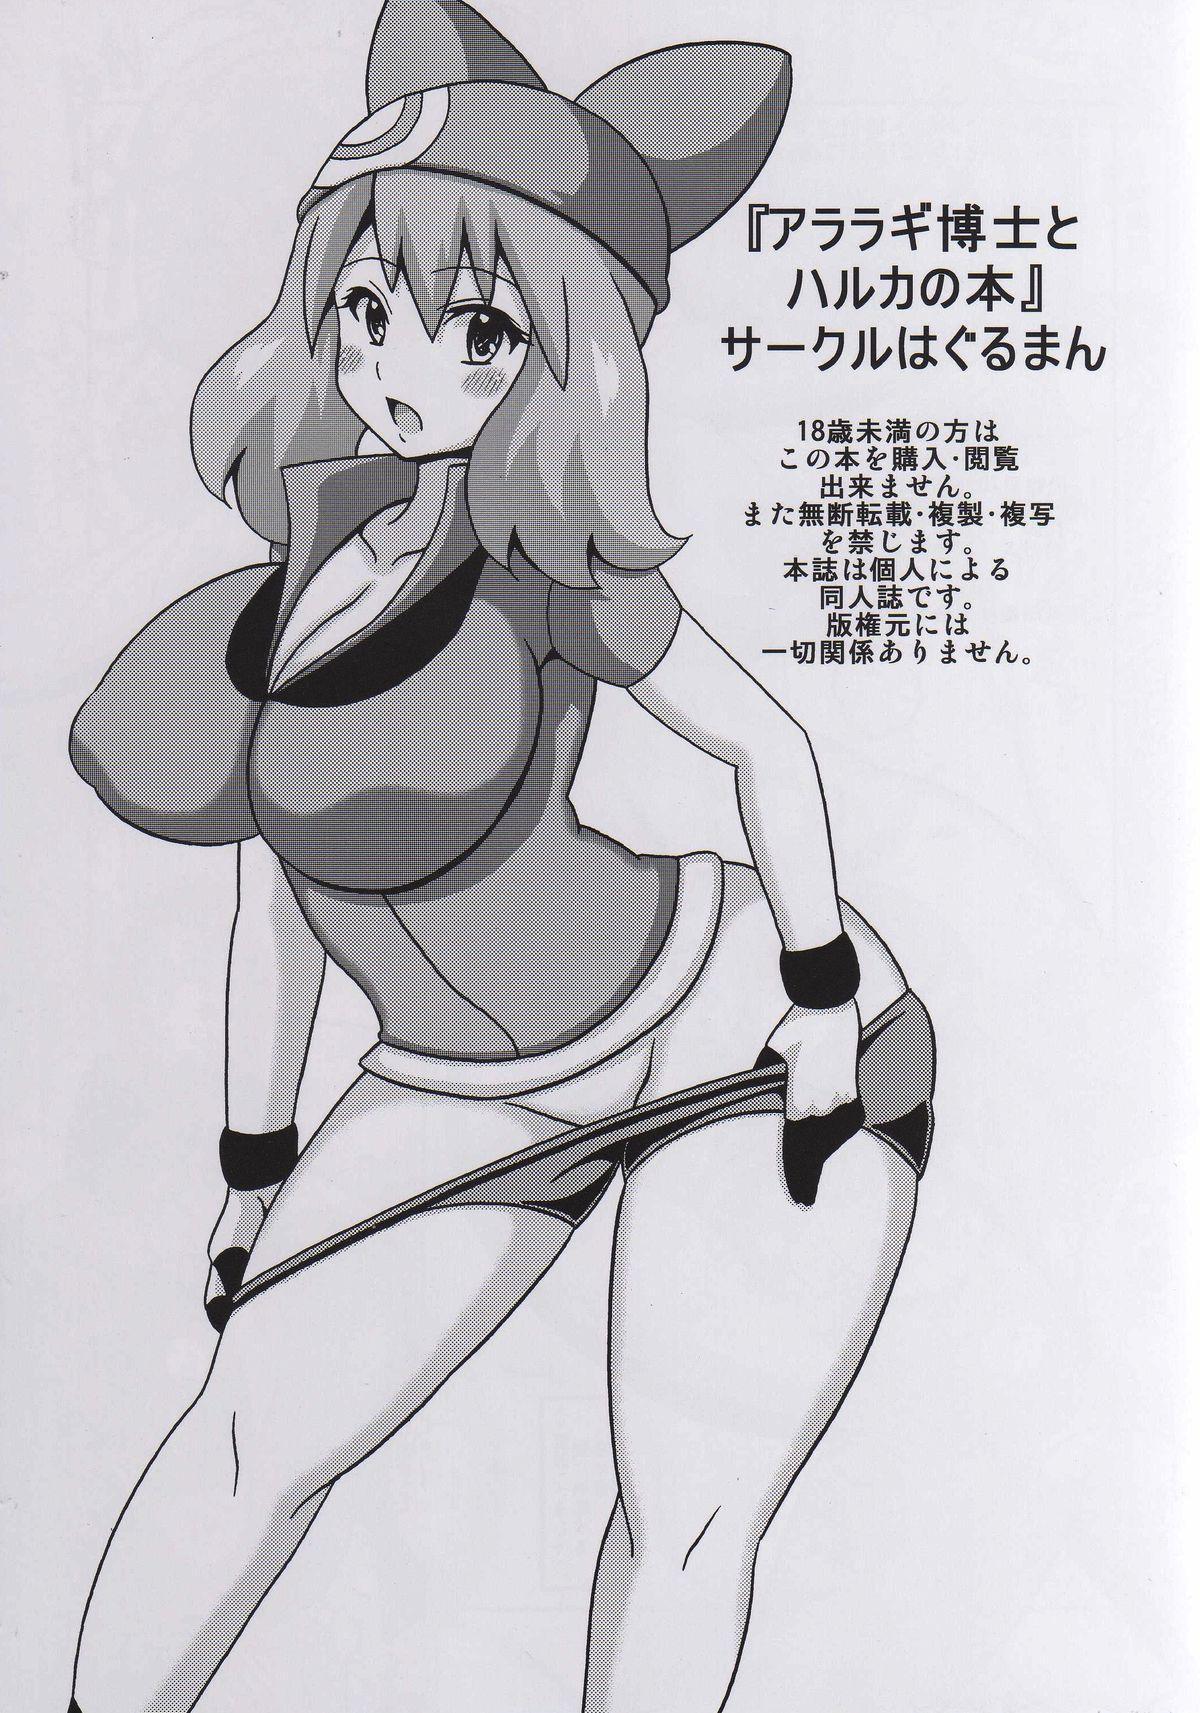 Araragi Hakase to Haruka no Hon 15